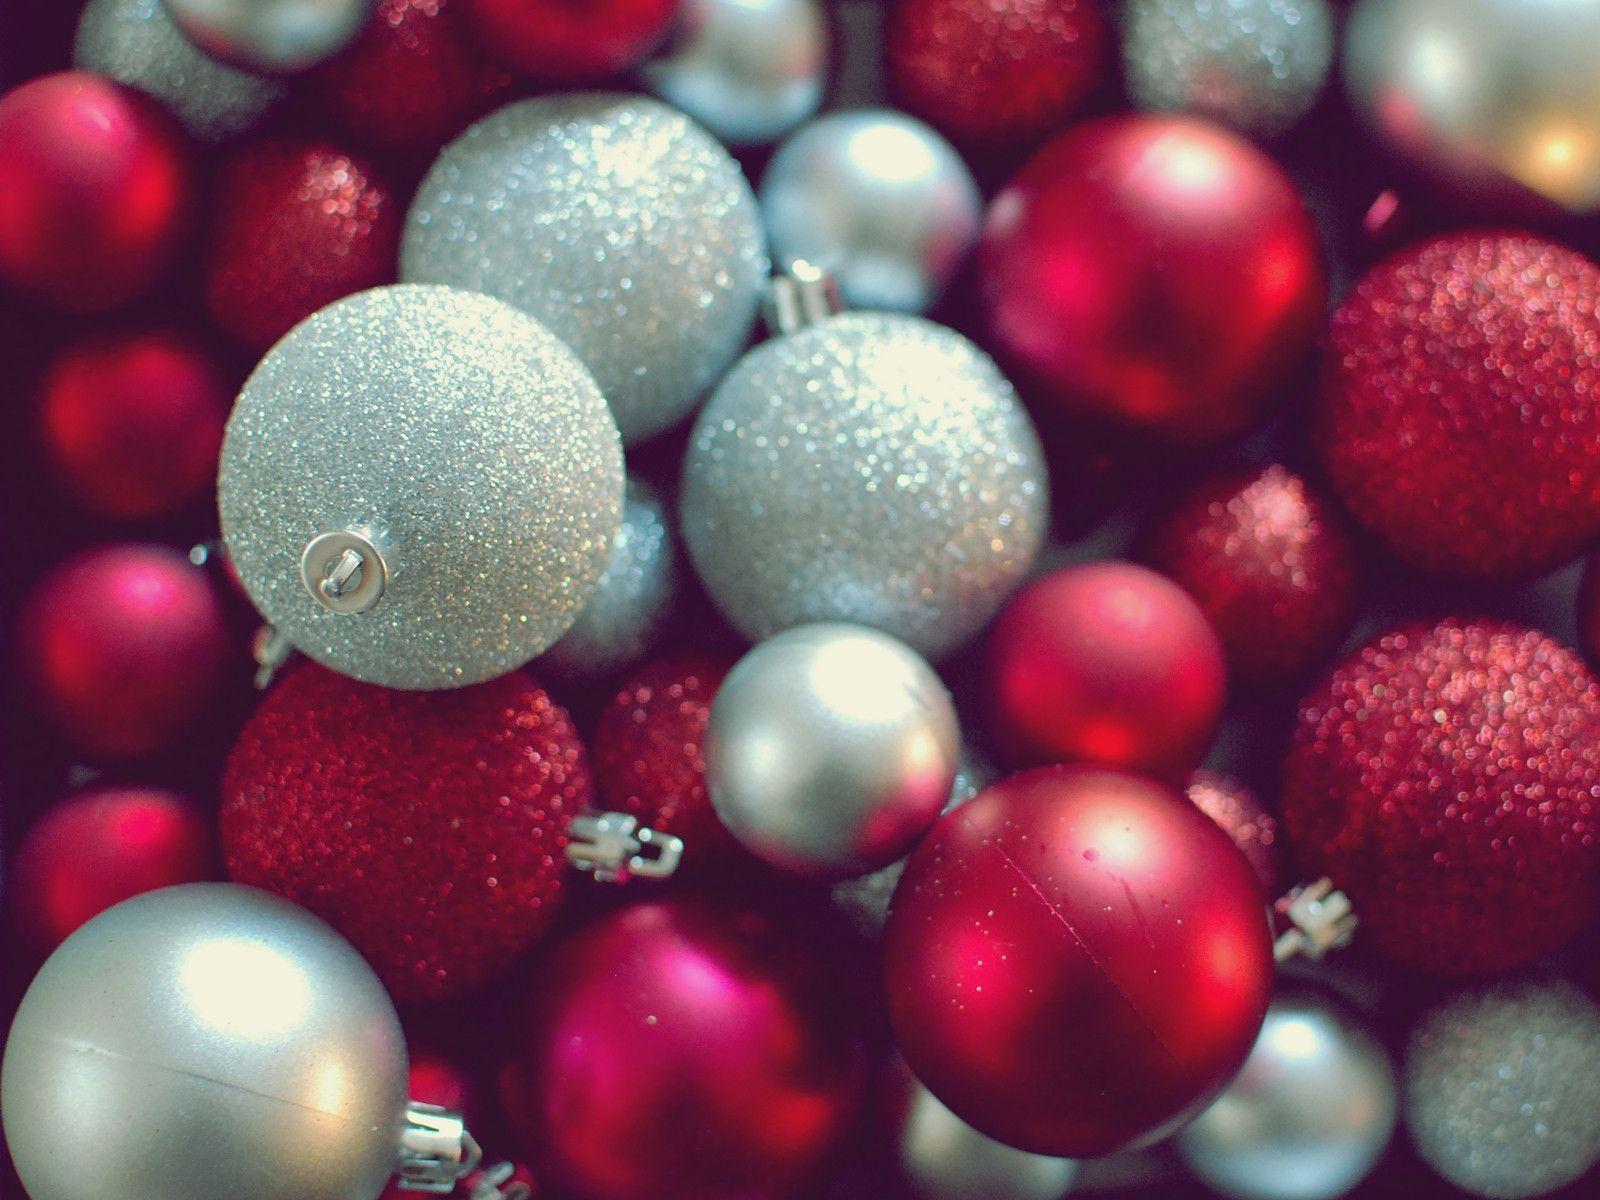 christmas ornament wallpaper 2015 - Grasscloth Wallpaper